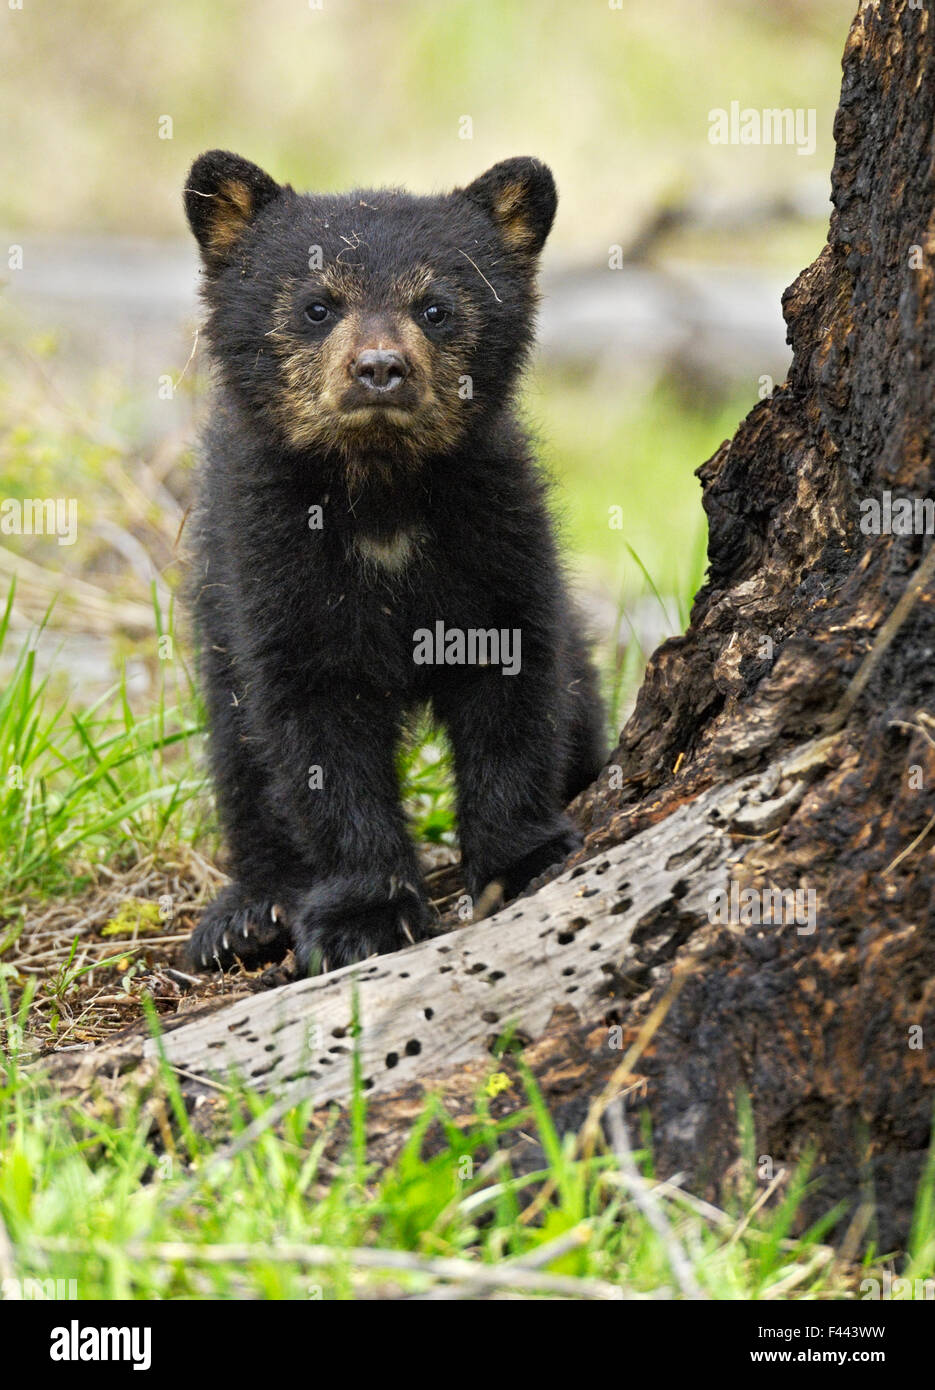 Amerikanische Schwarzbären (Ursus Americanus) Cub. Yellowstone-Nationalpark, Wyoming, Juni. Stockbild